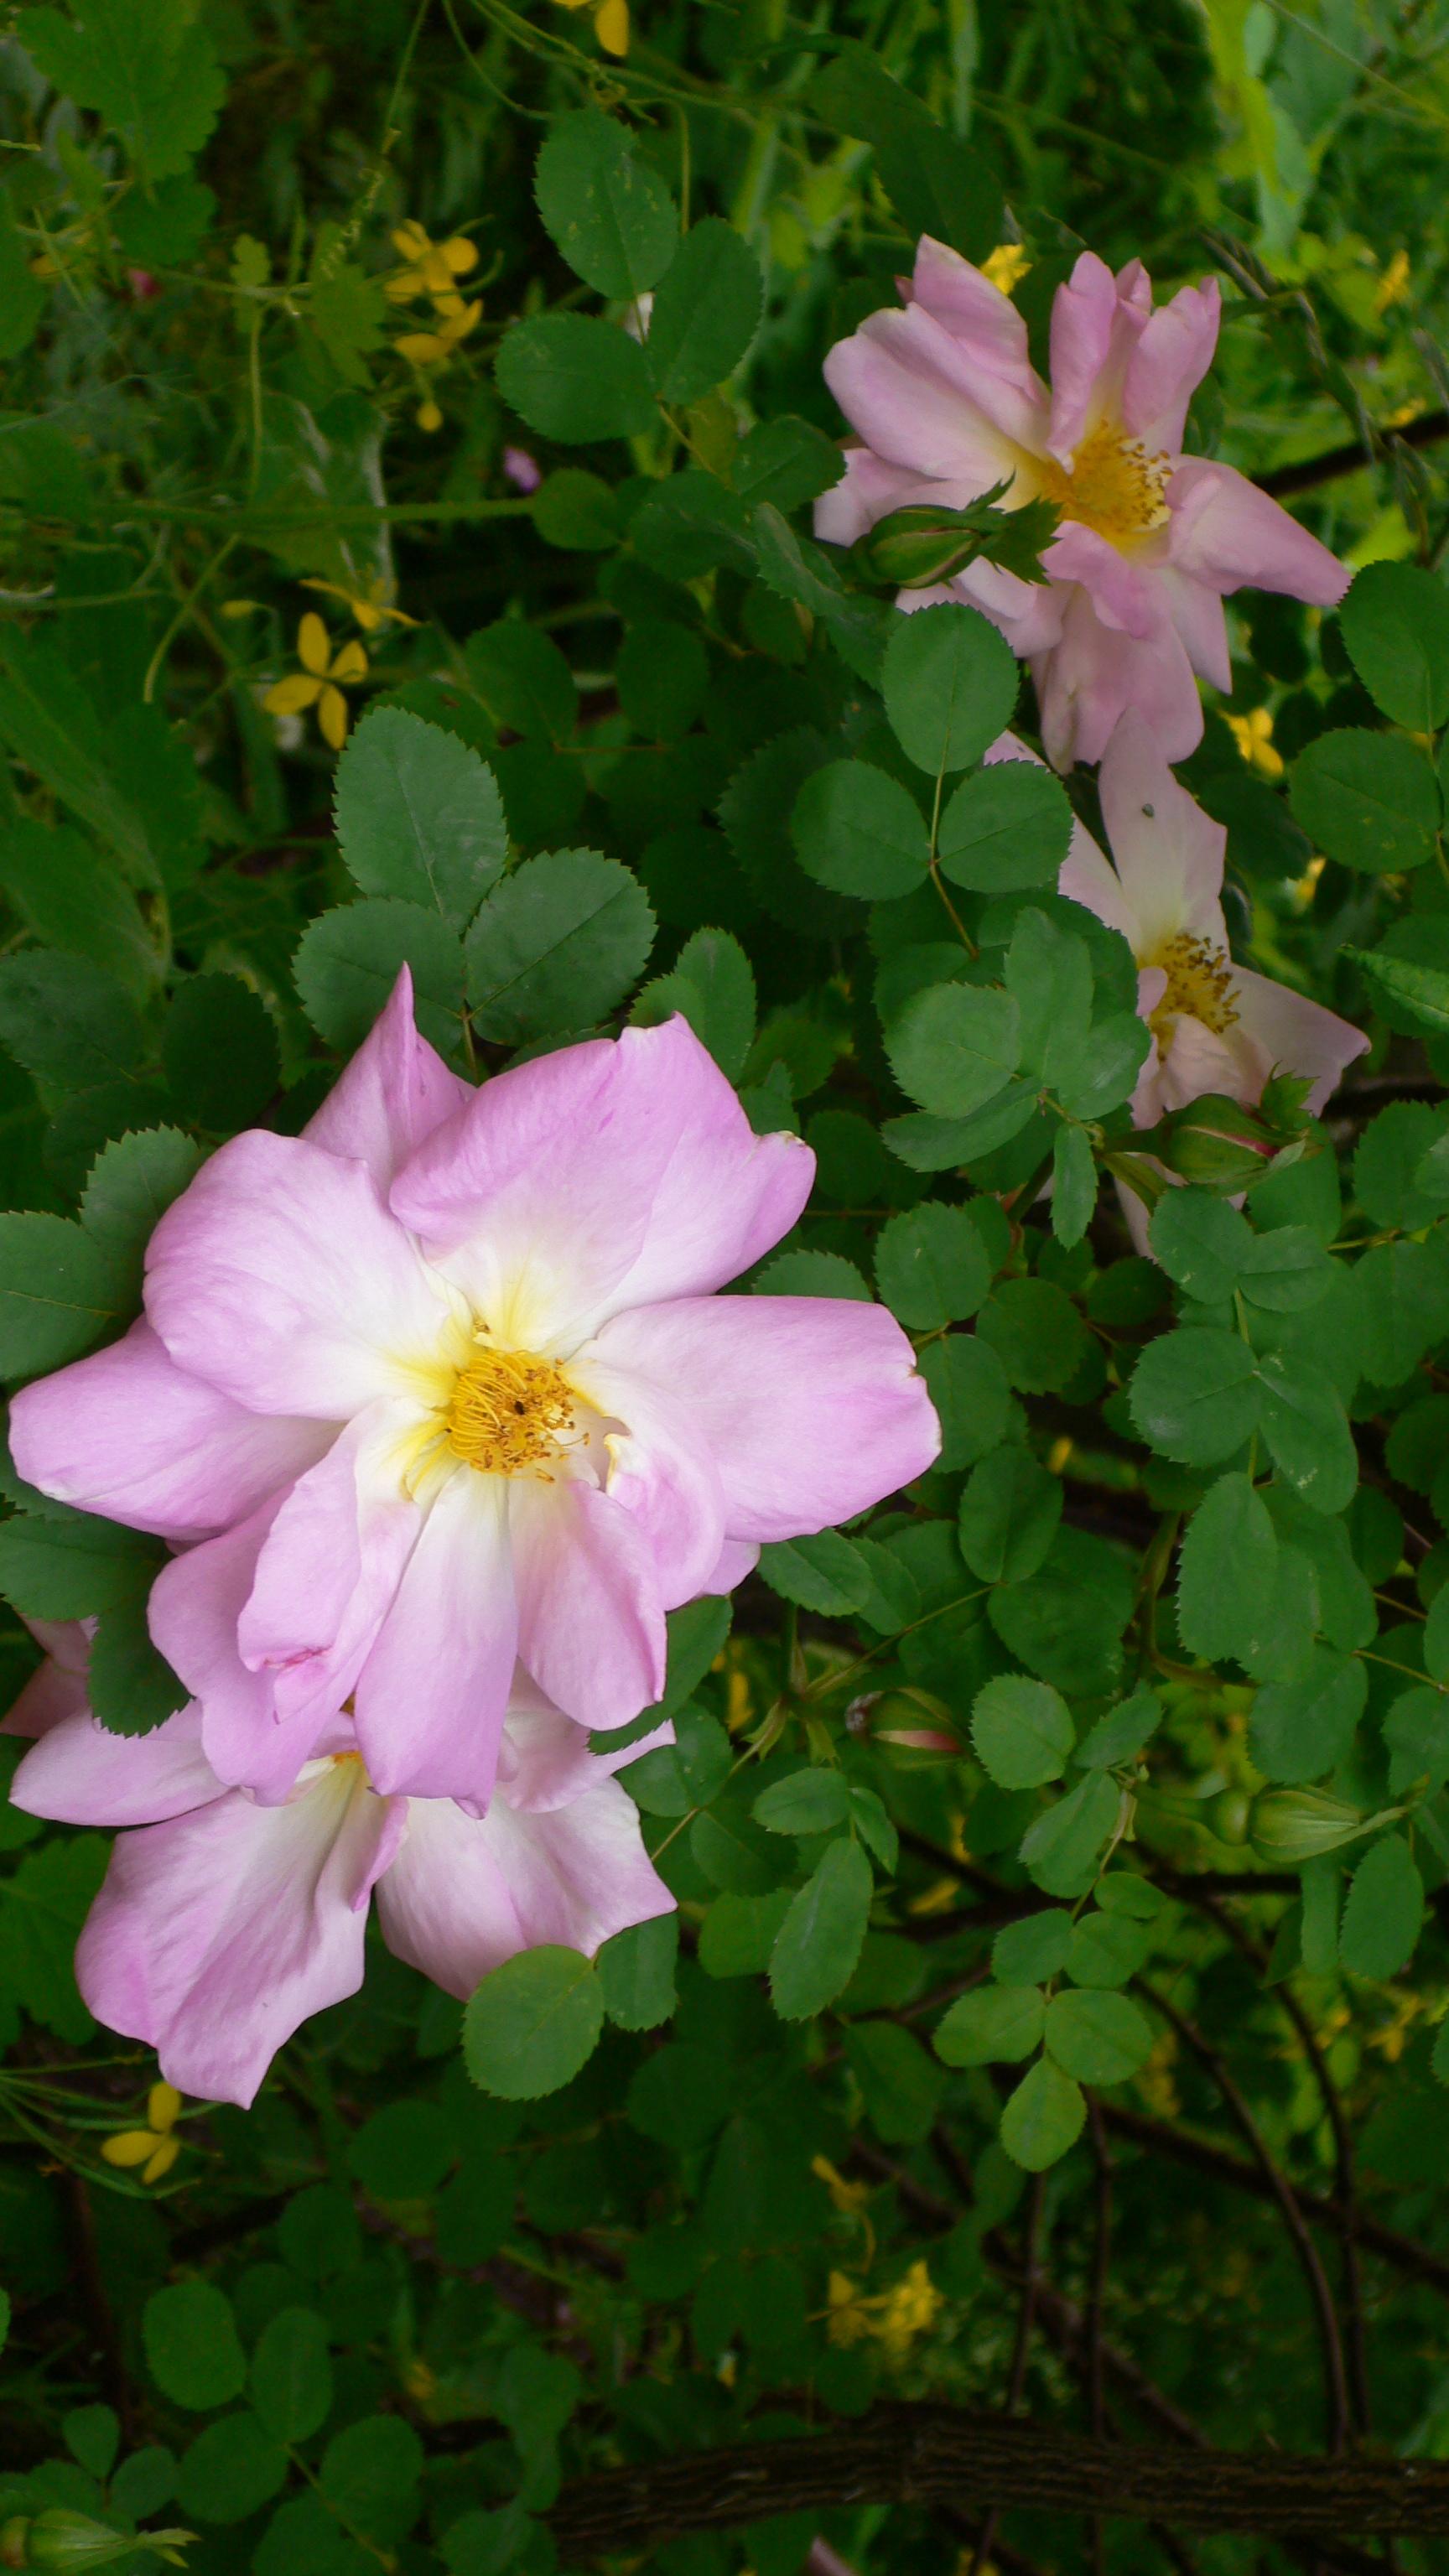 file rosa 39 marguerite hilling 39 d tail de la fleur jardin des roses anciennes. Black Bedroom Furniture Sets. Home Design Ideas